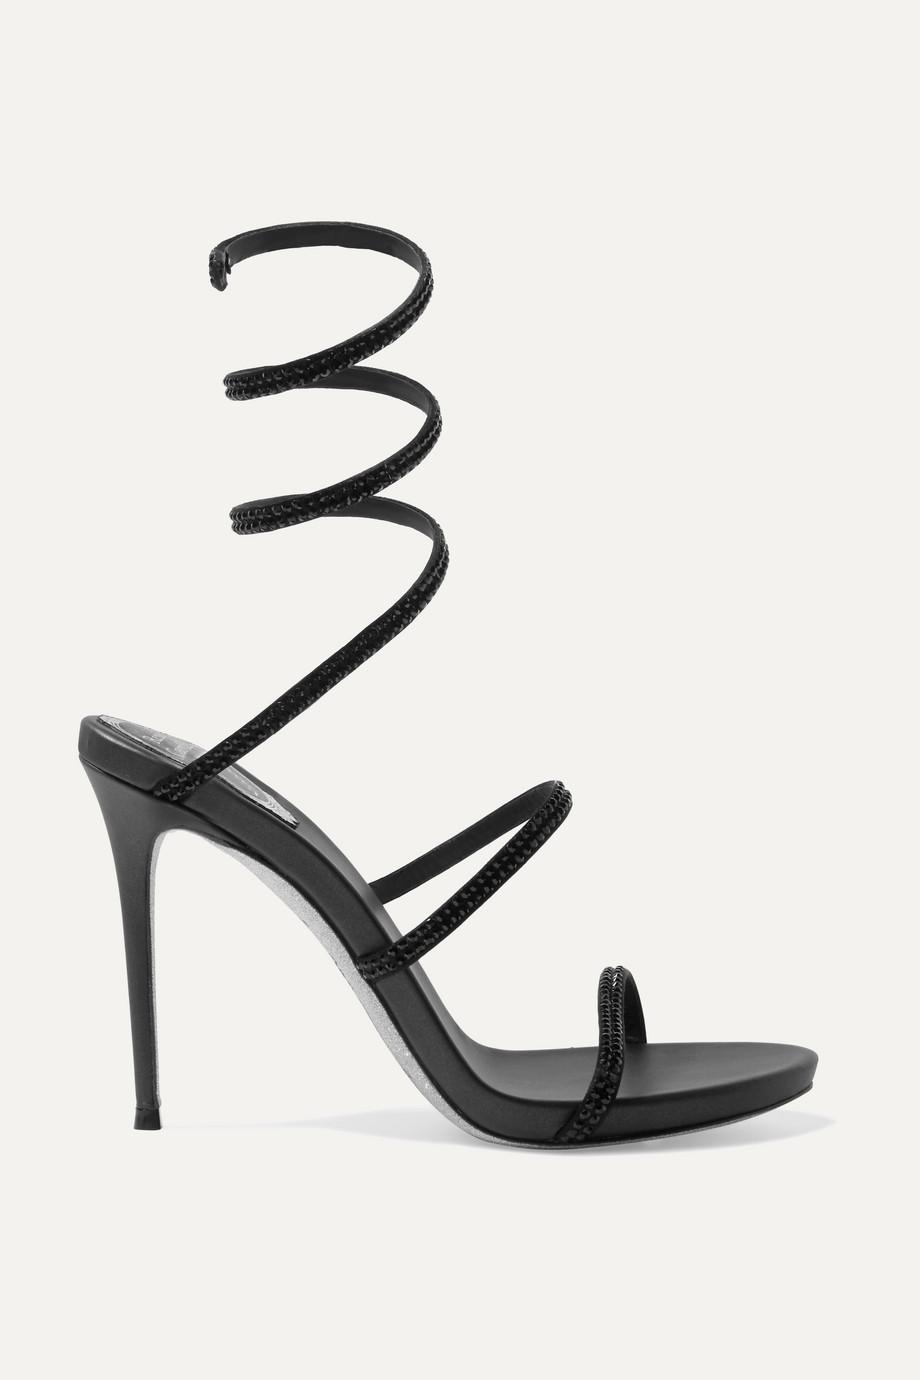 44e0792969f2 René Caovilla Cleo crystal-embellished leather sandals